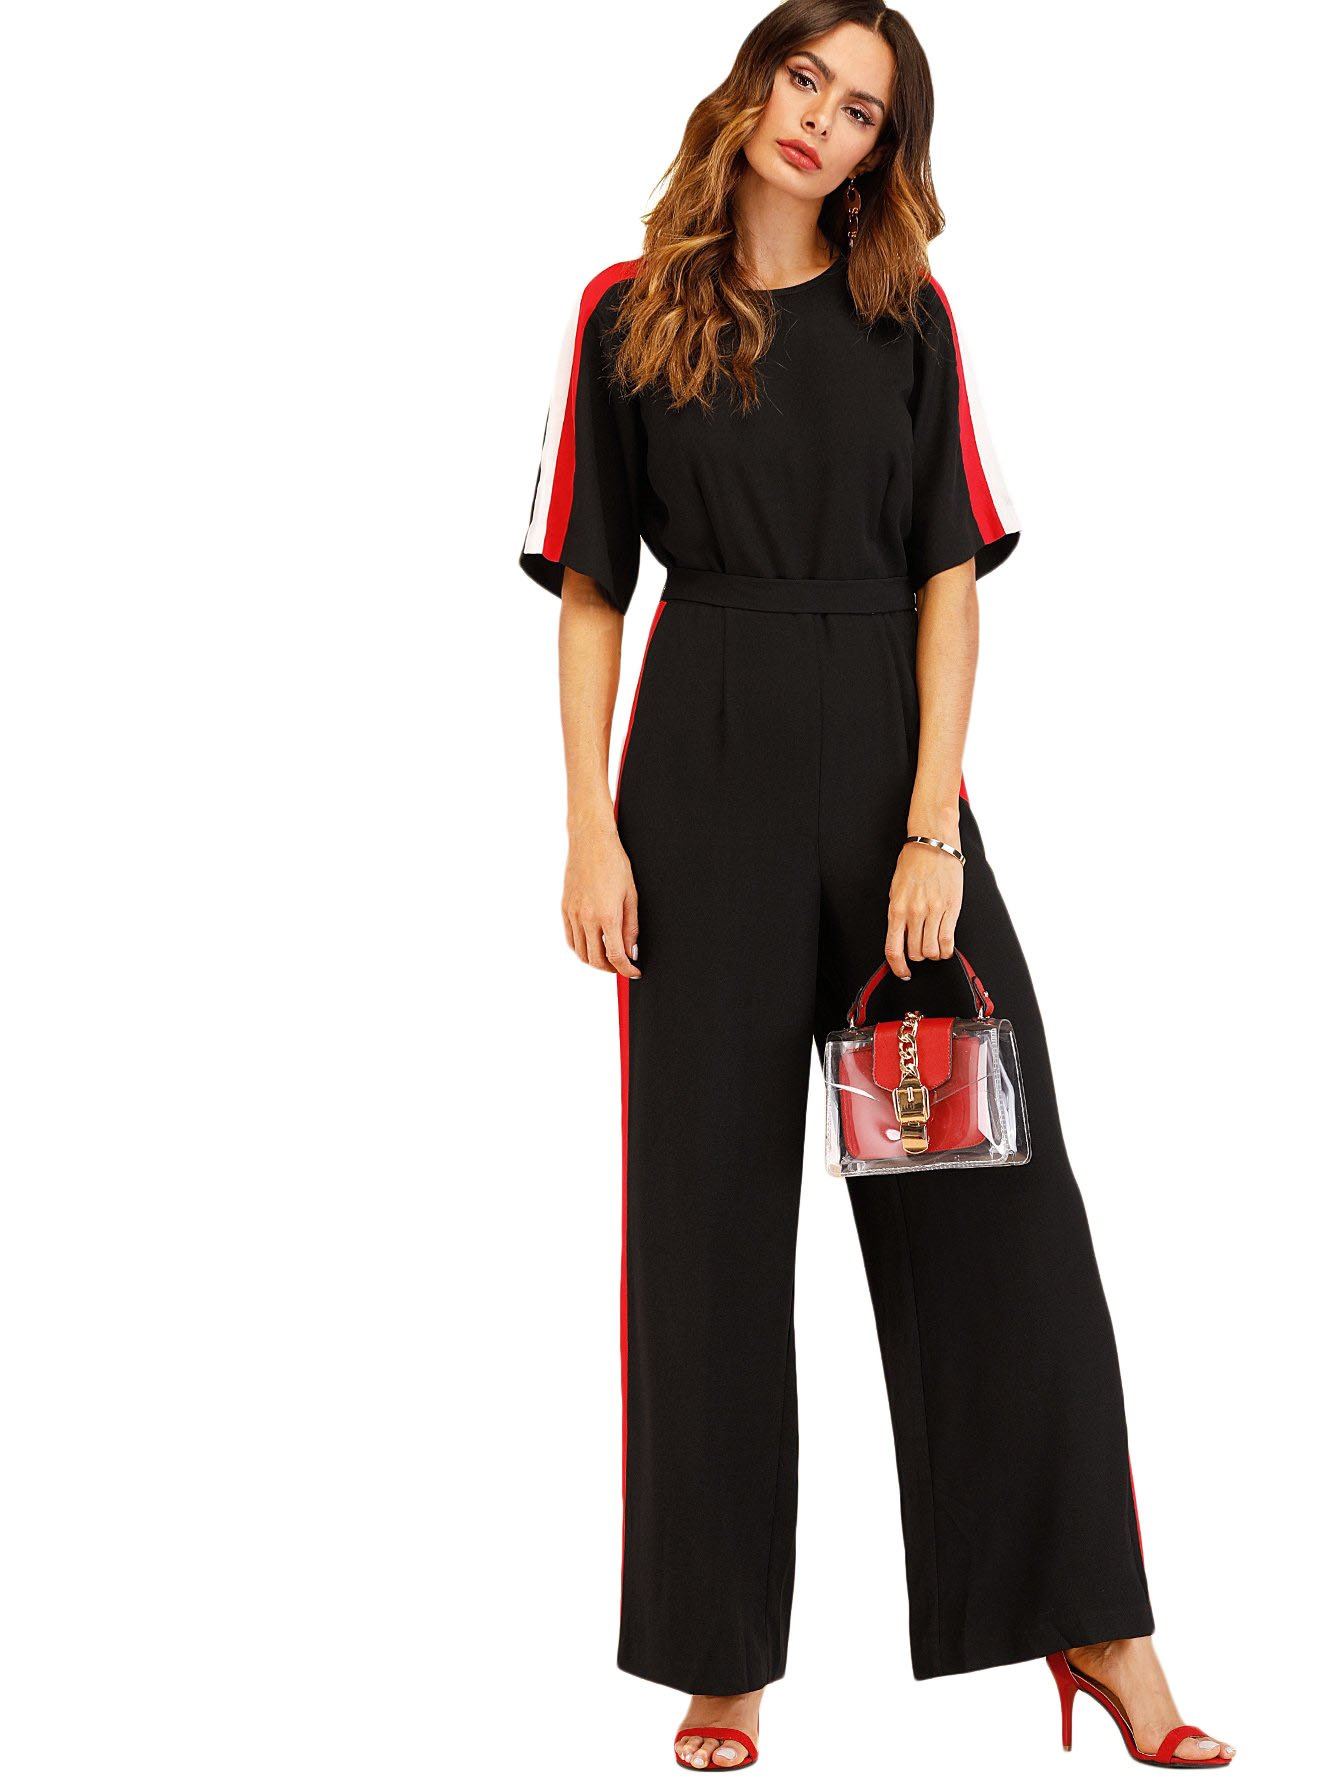 Verdusa Women's Round Neck Self Tie Waist Belted Loose Culottes Jumpsuit Black S